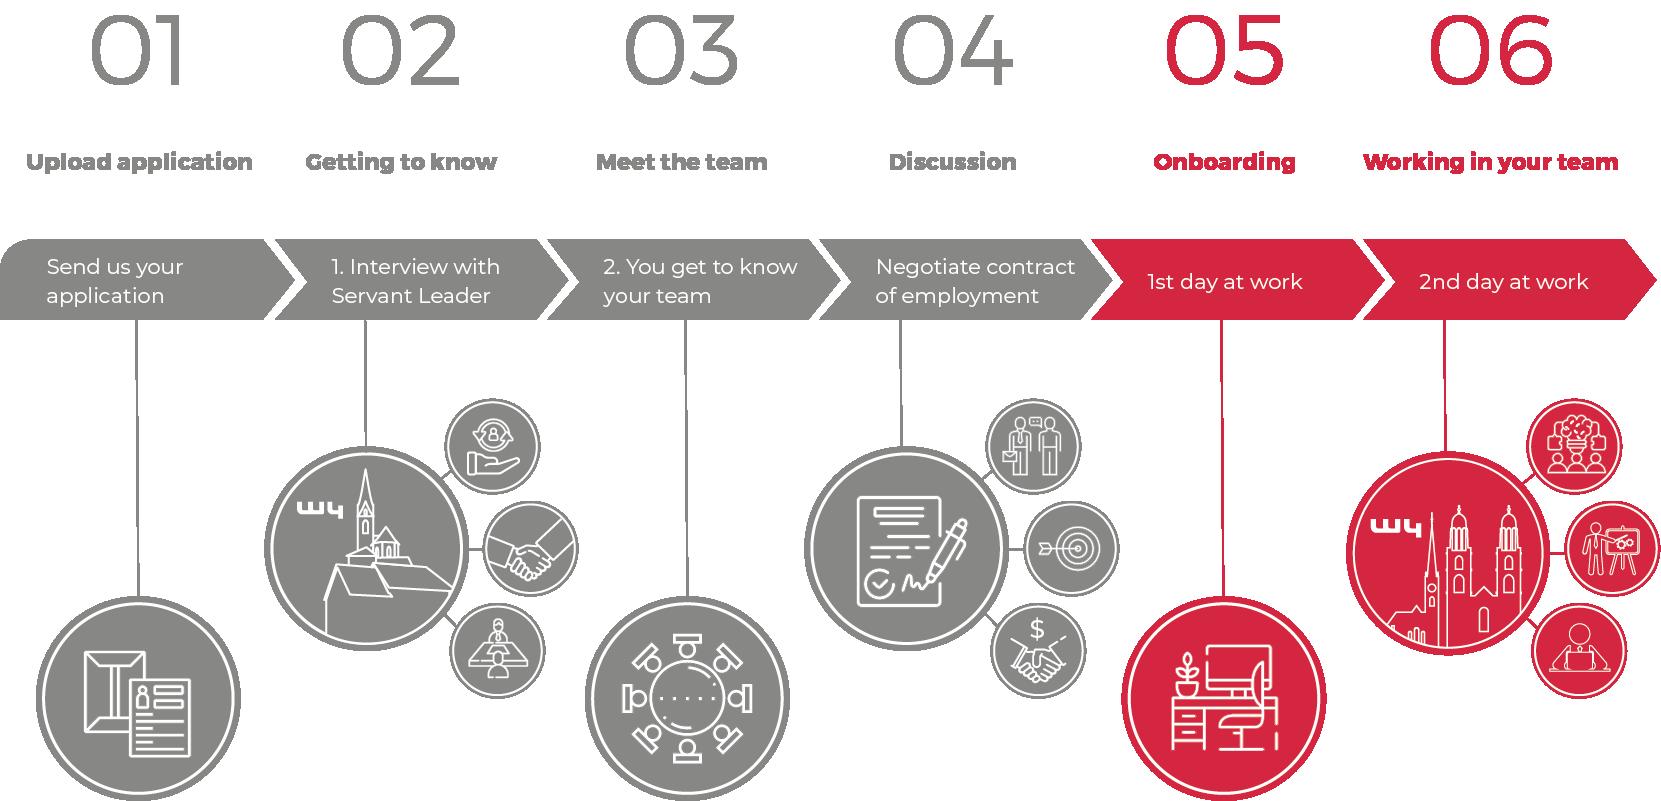 W4 Application Process